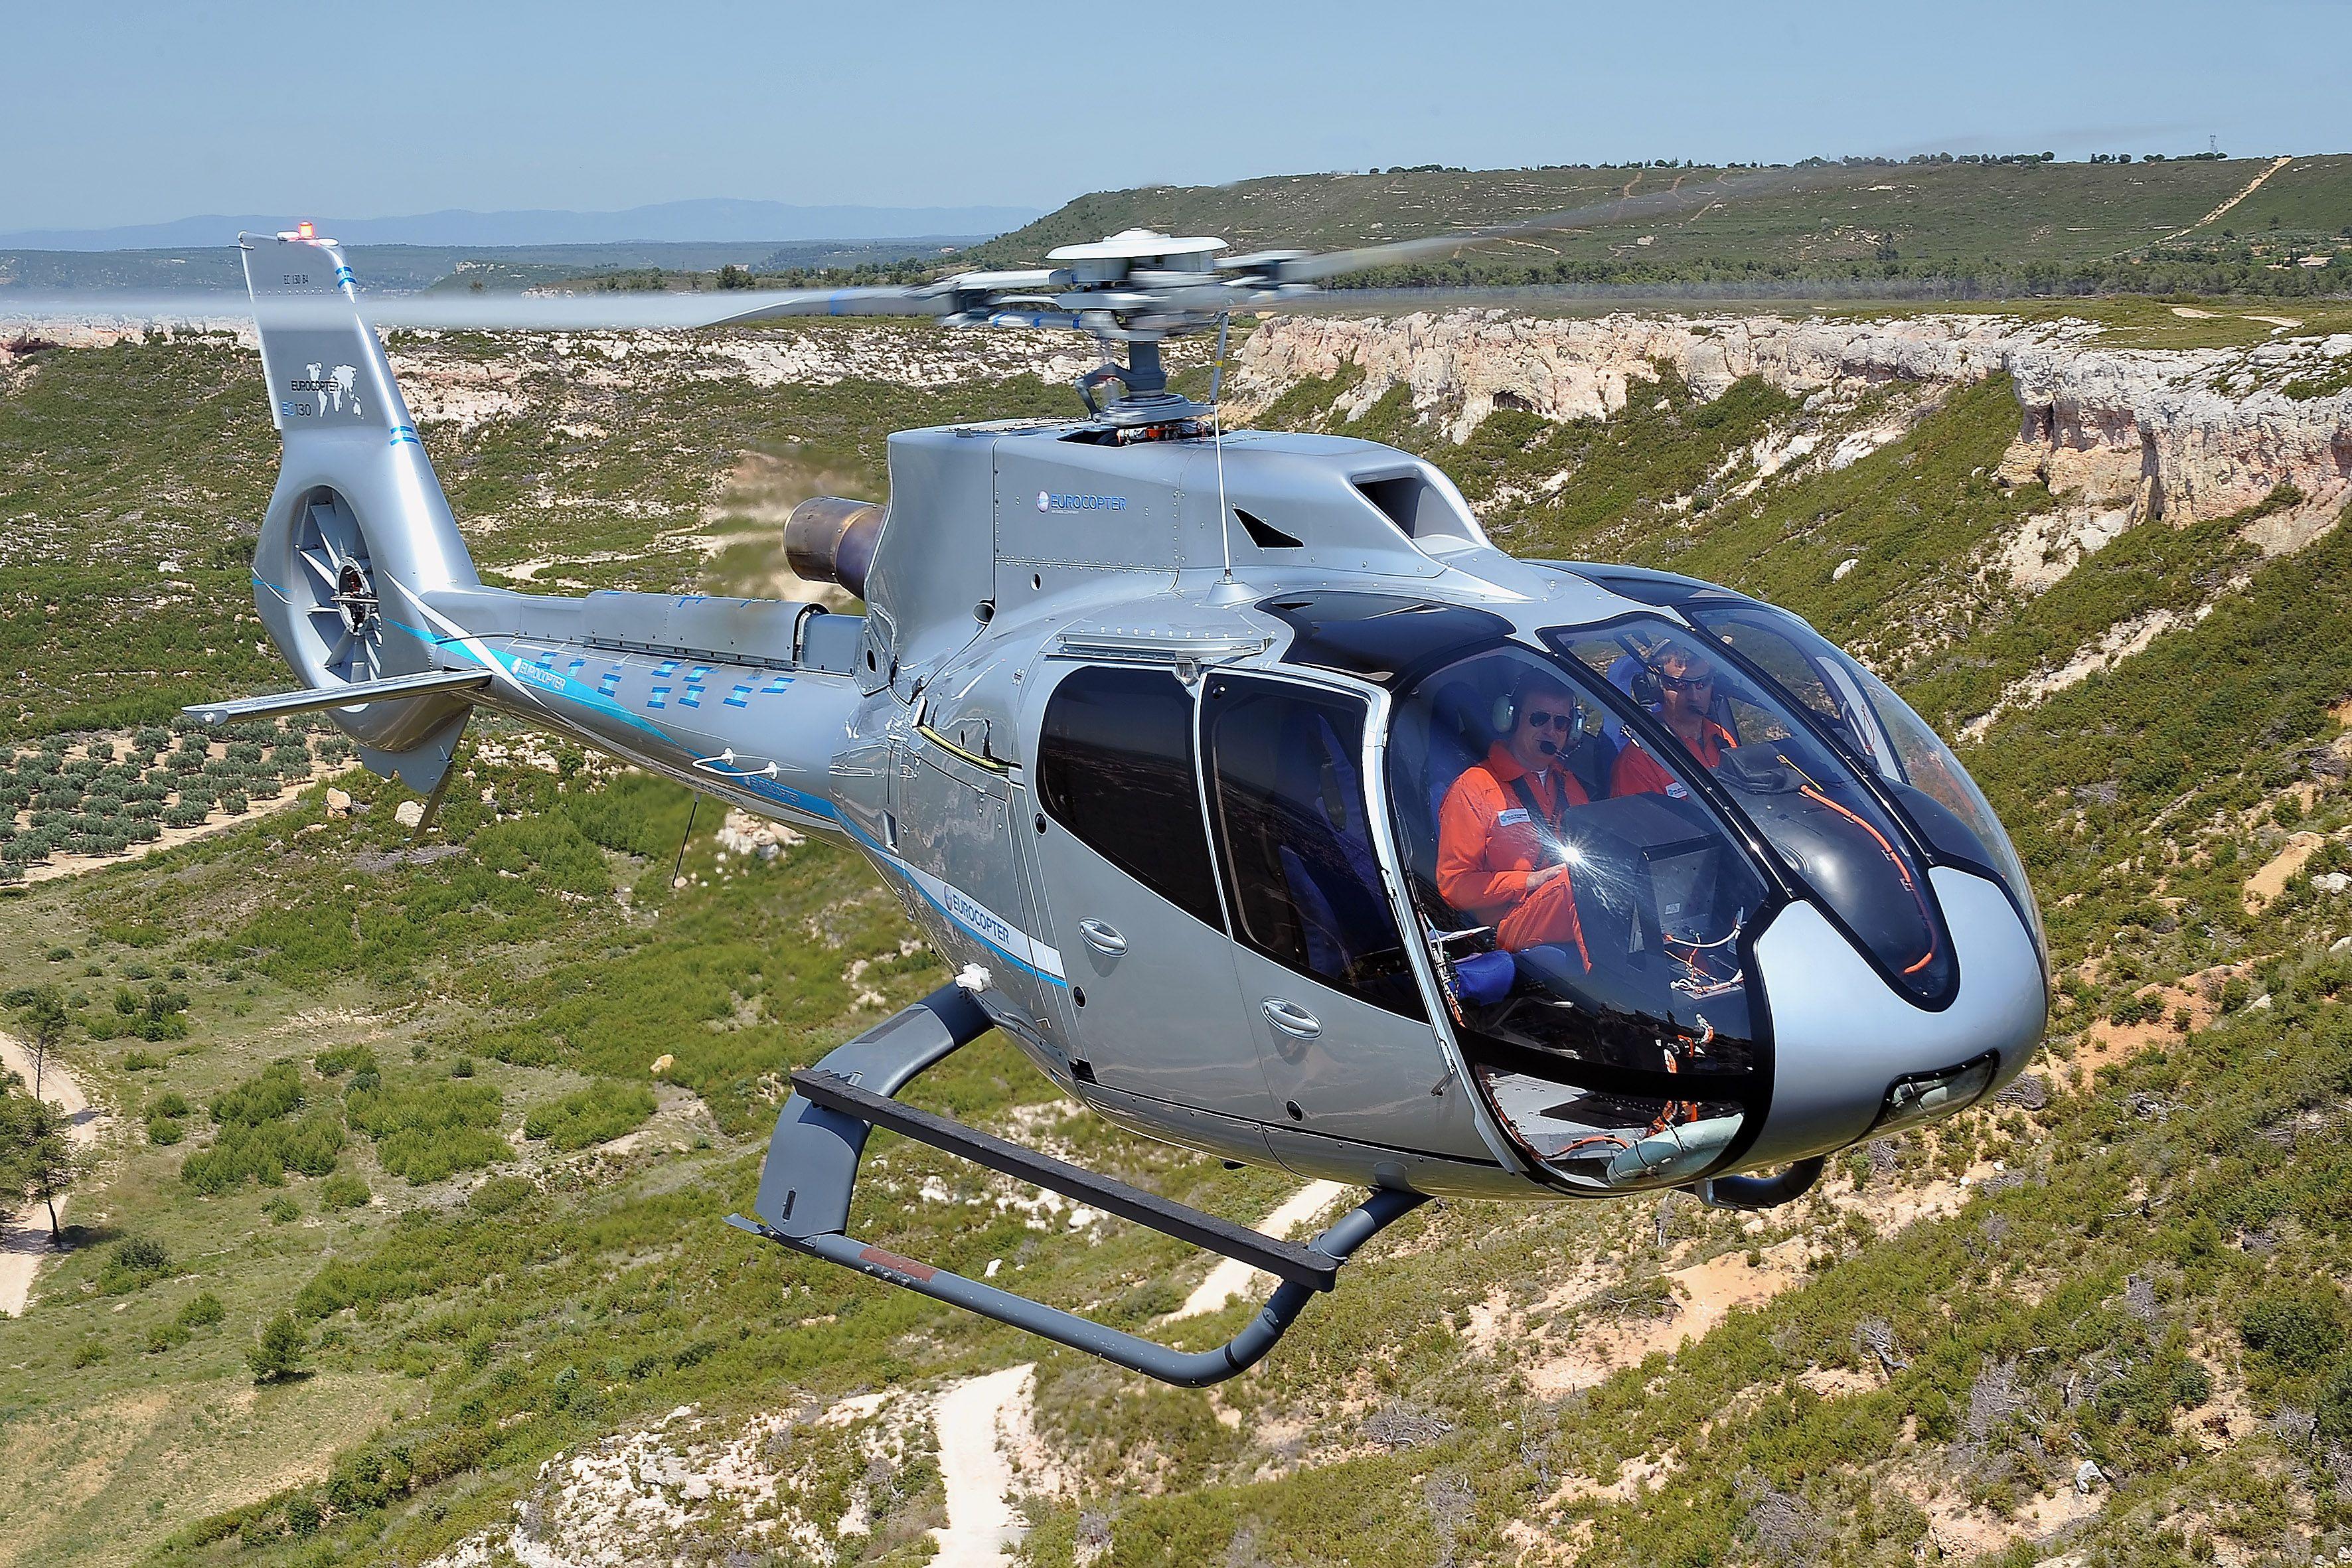 Pin on Aviones y Helicopteros